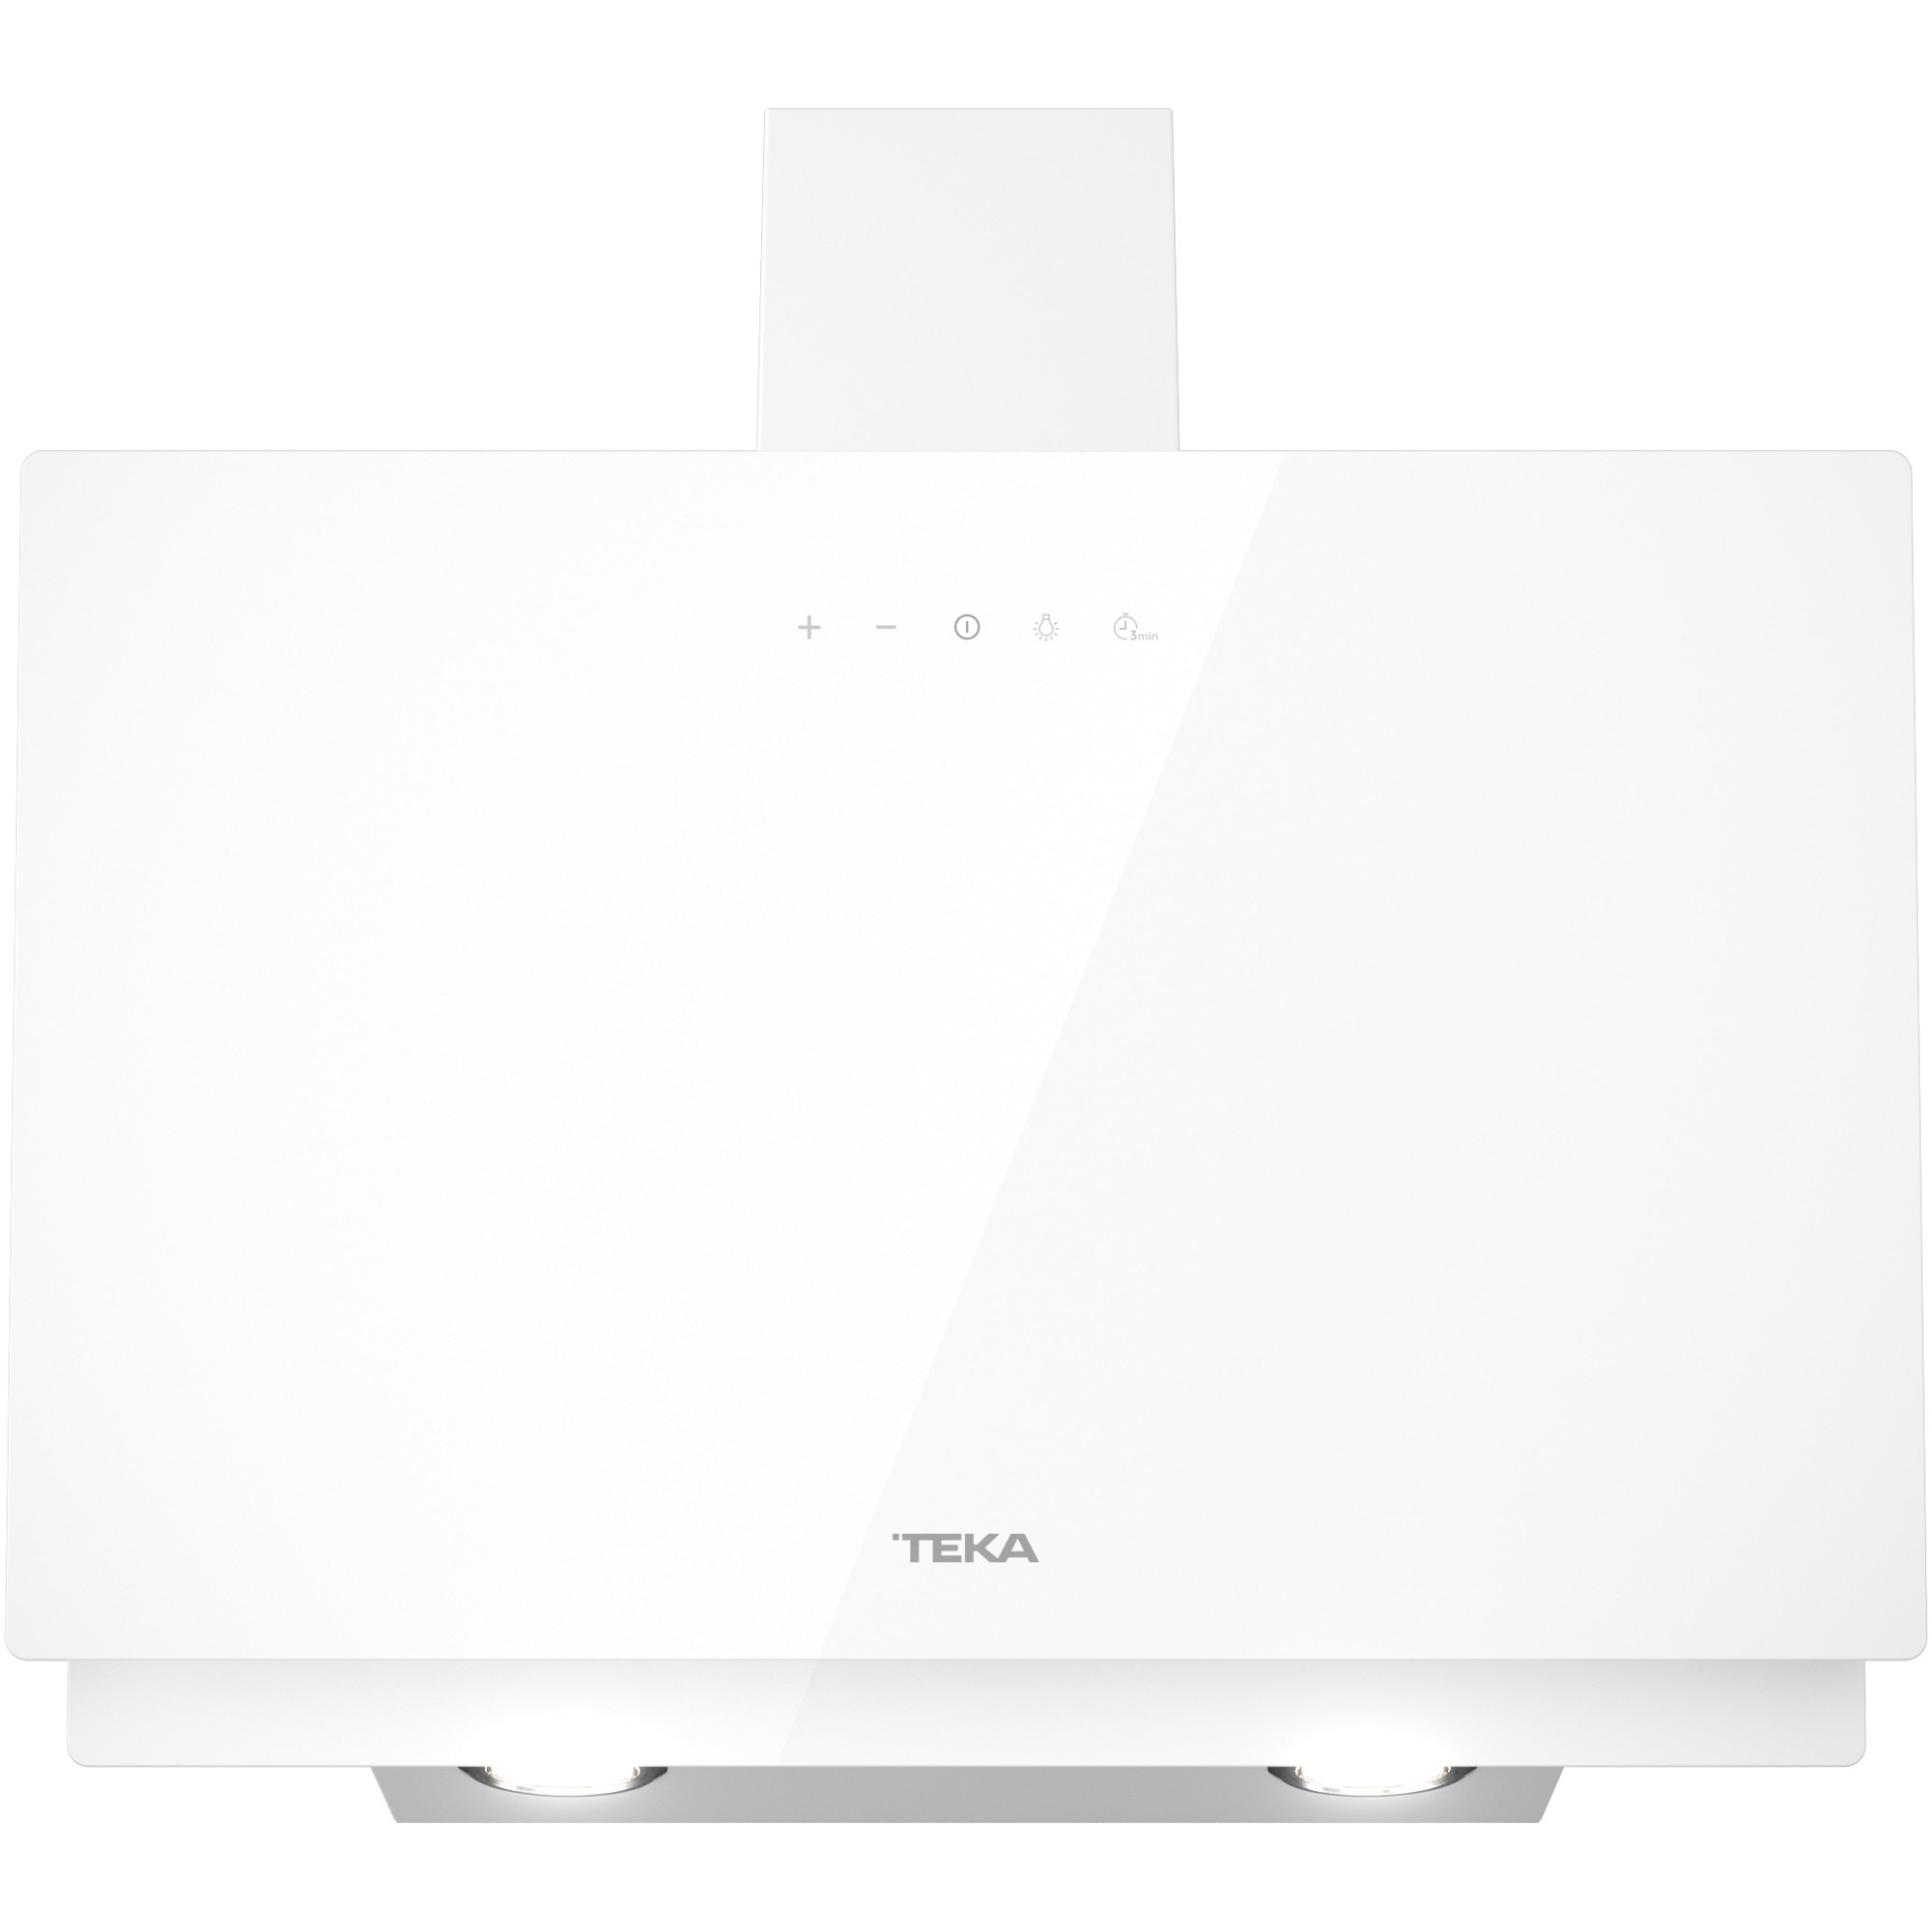 Fotografie Hota incorporabila decorativa TEKA DVN 64030 WHT, Putere de absorbtie 460 mc/h, Touch control, 60 cm, Sticla alba